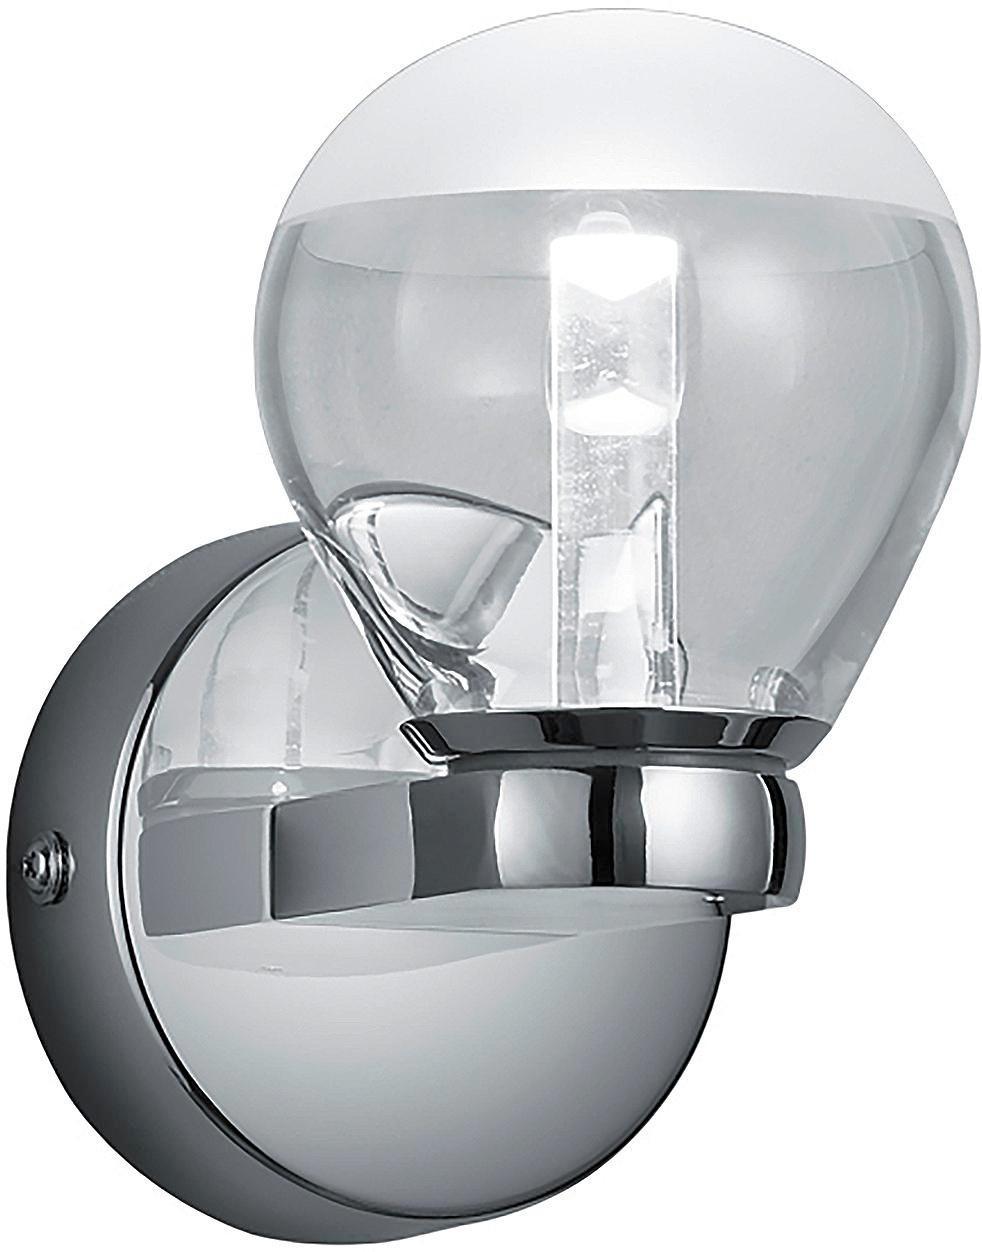 BADEZIMMER-WANDLEUCHTE - Chromfarben/Klar, Design, Kunststoff/Metall (14,5/9,0/12,5cm)